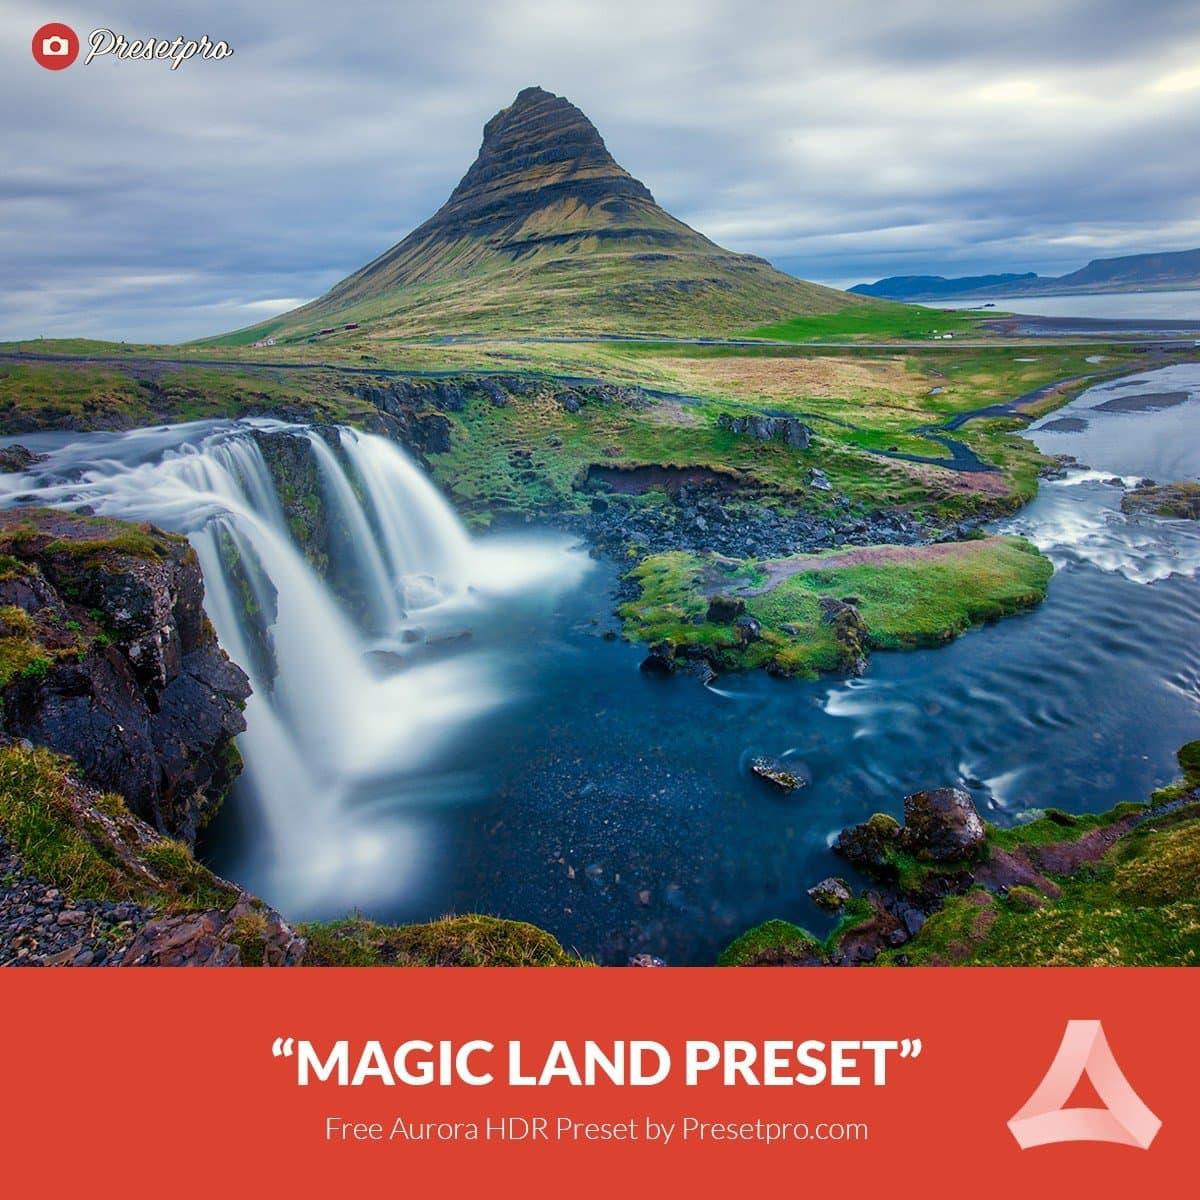 Free-Aurora-HDR-Preset-Magic-Landscape-Presetpro